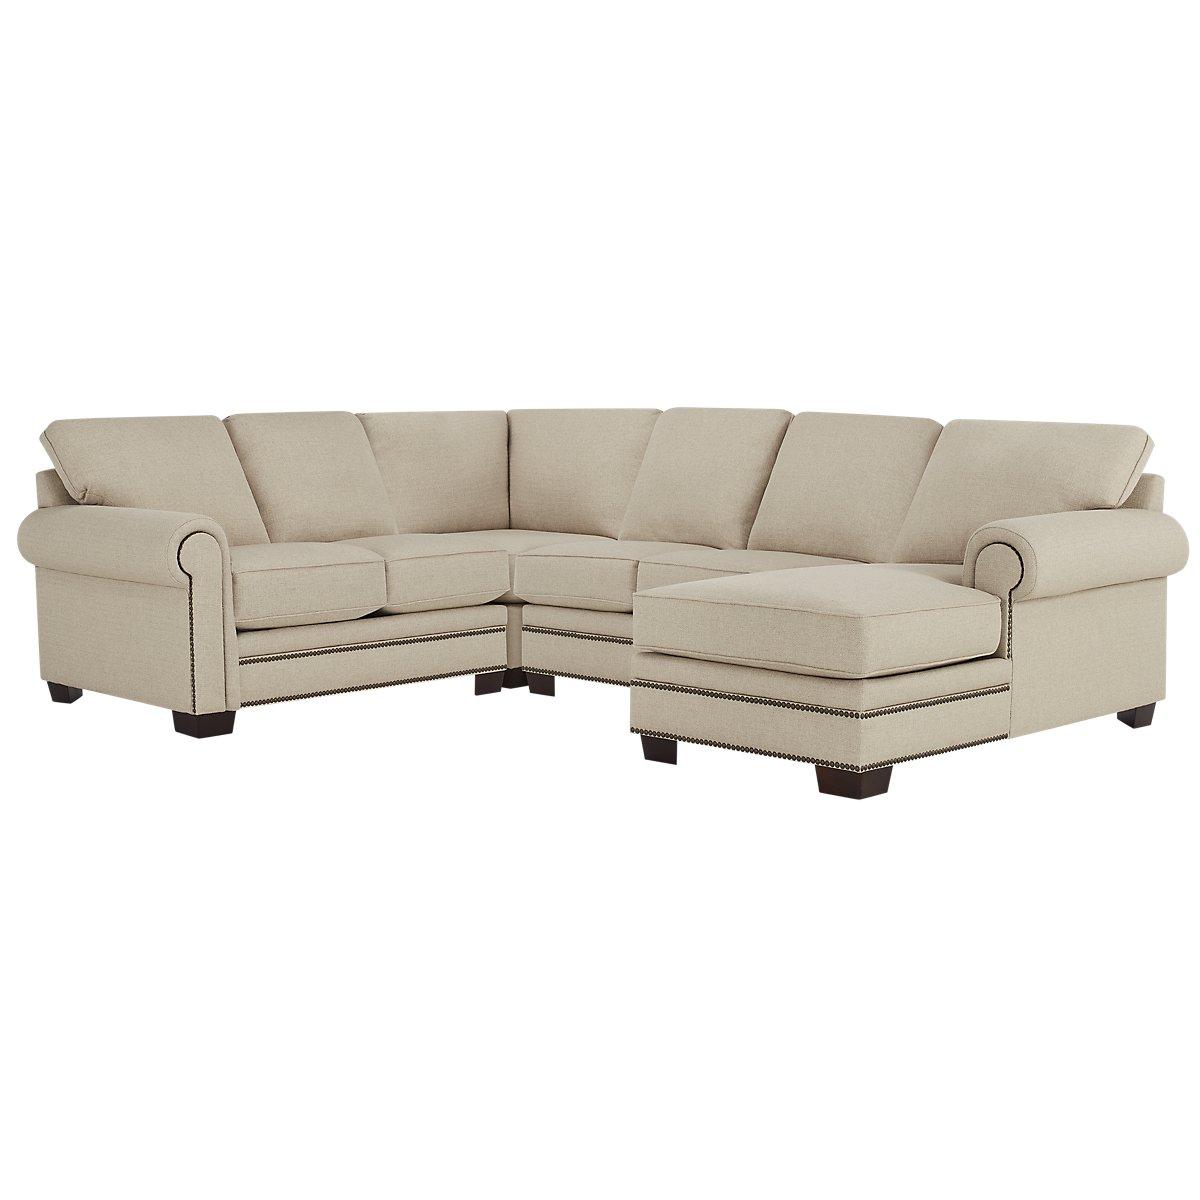 City furniture foster khaki fabric medium right chaise for Chaise kaki